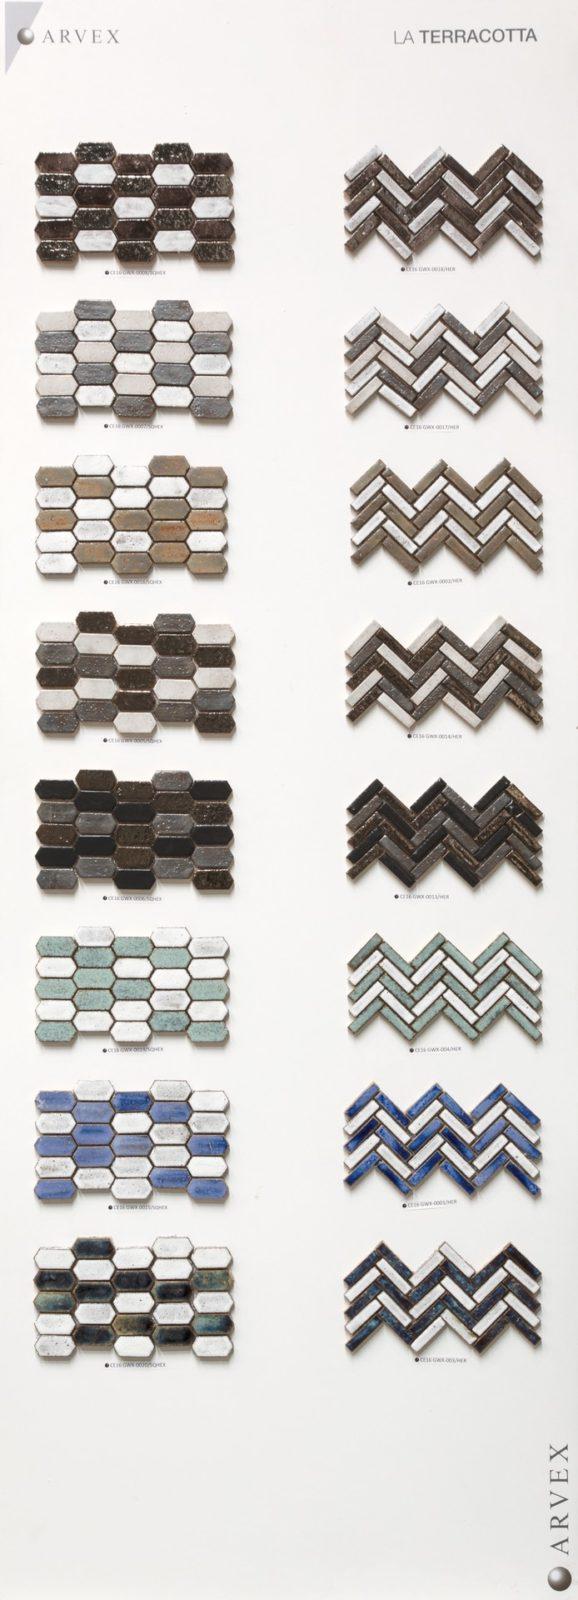 Mosaico - La Terracotta 02